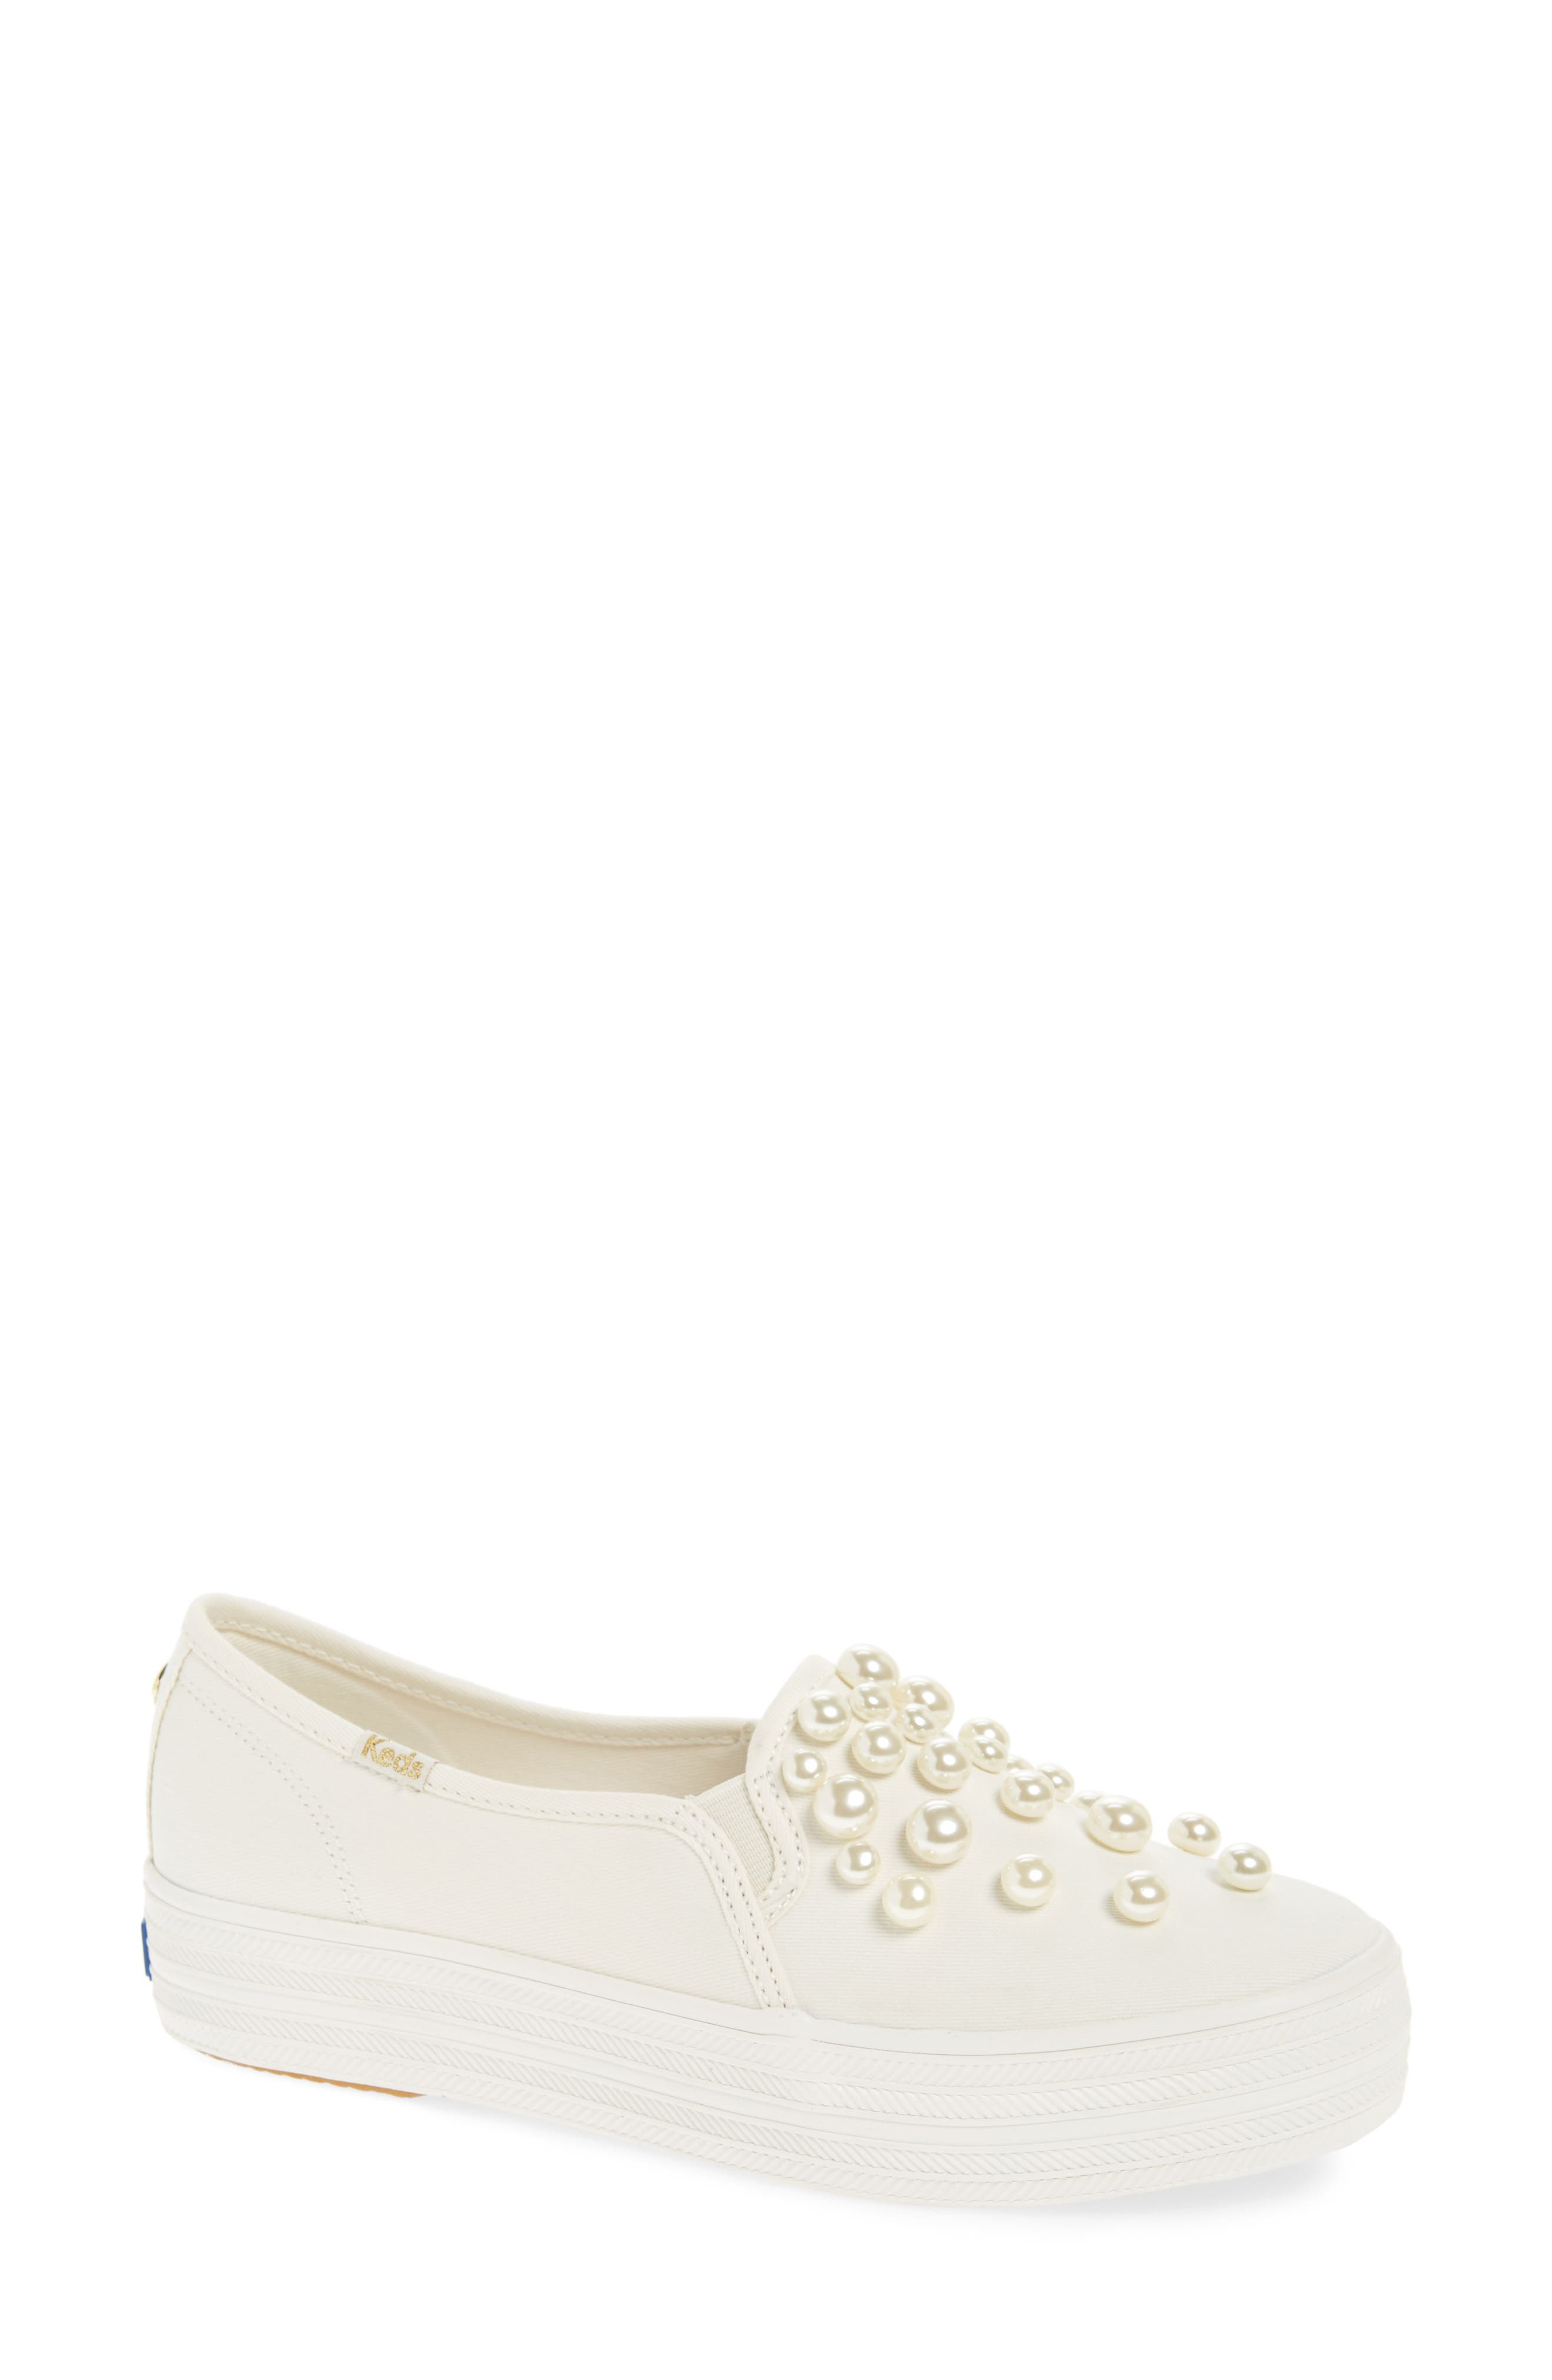 KEDS<SUP>®</SUP> FOR KATE SPADE NEW YORK, triple decker embellished slip-on sneaker, Main thumbnail 1, color, CREAM